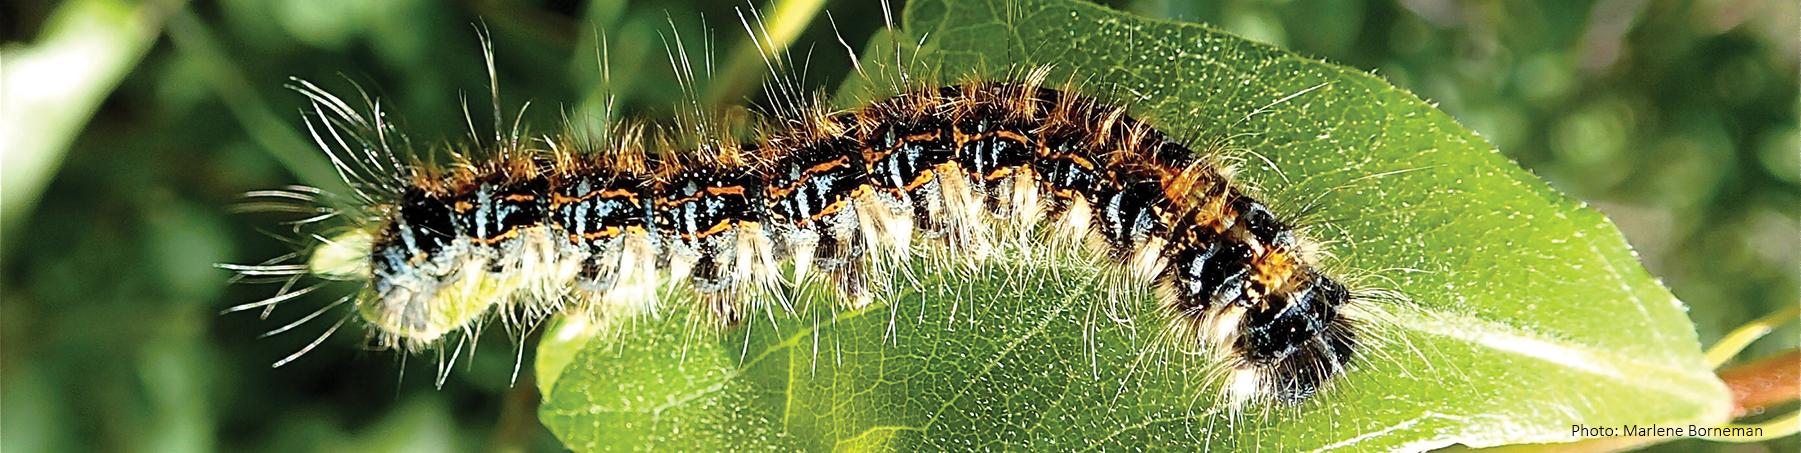 Caterpillar MBorneman